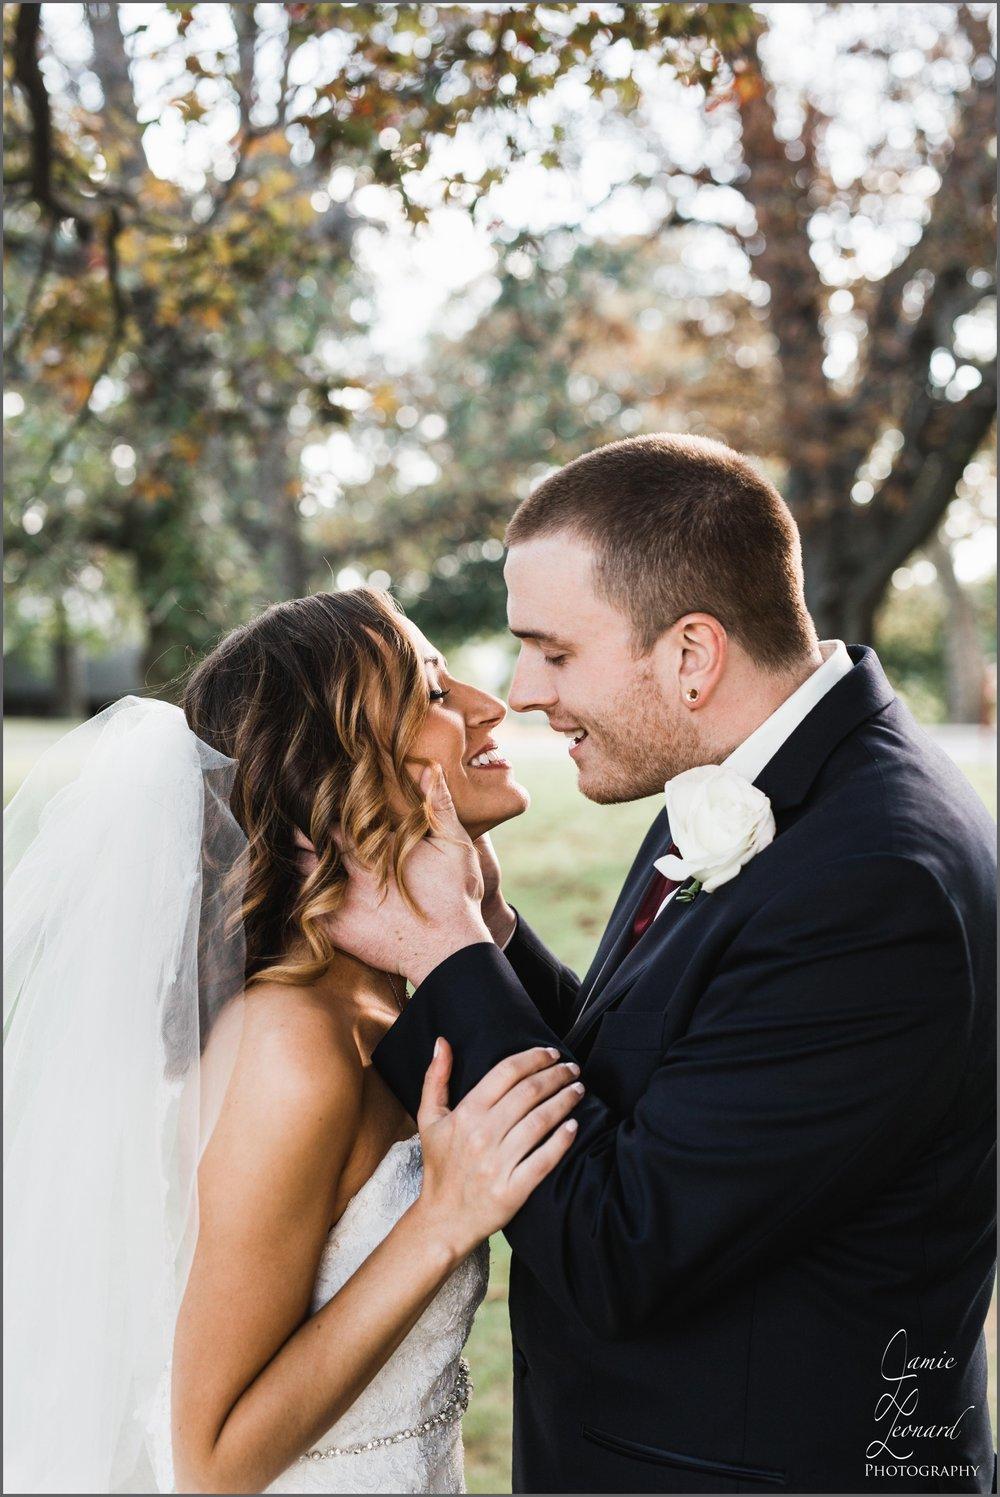 wedding_seton_hill_church_lakeview_greensburg_jamie_leonard_photography_photographer_engagement.jpg